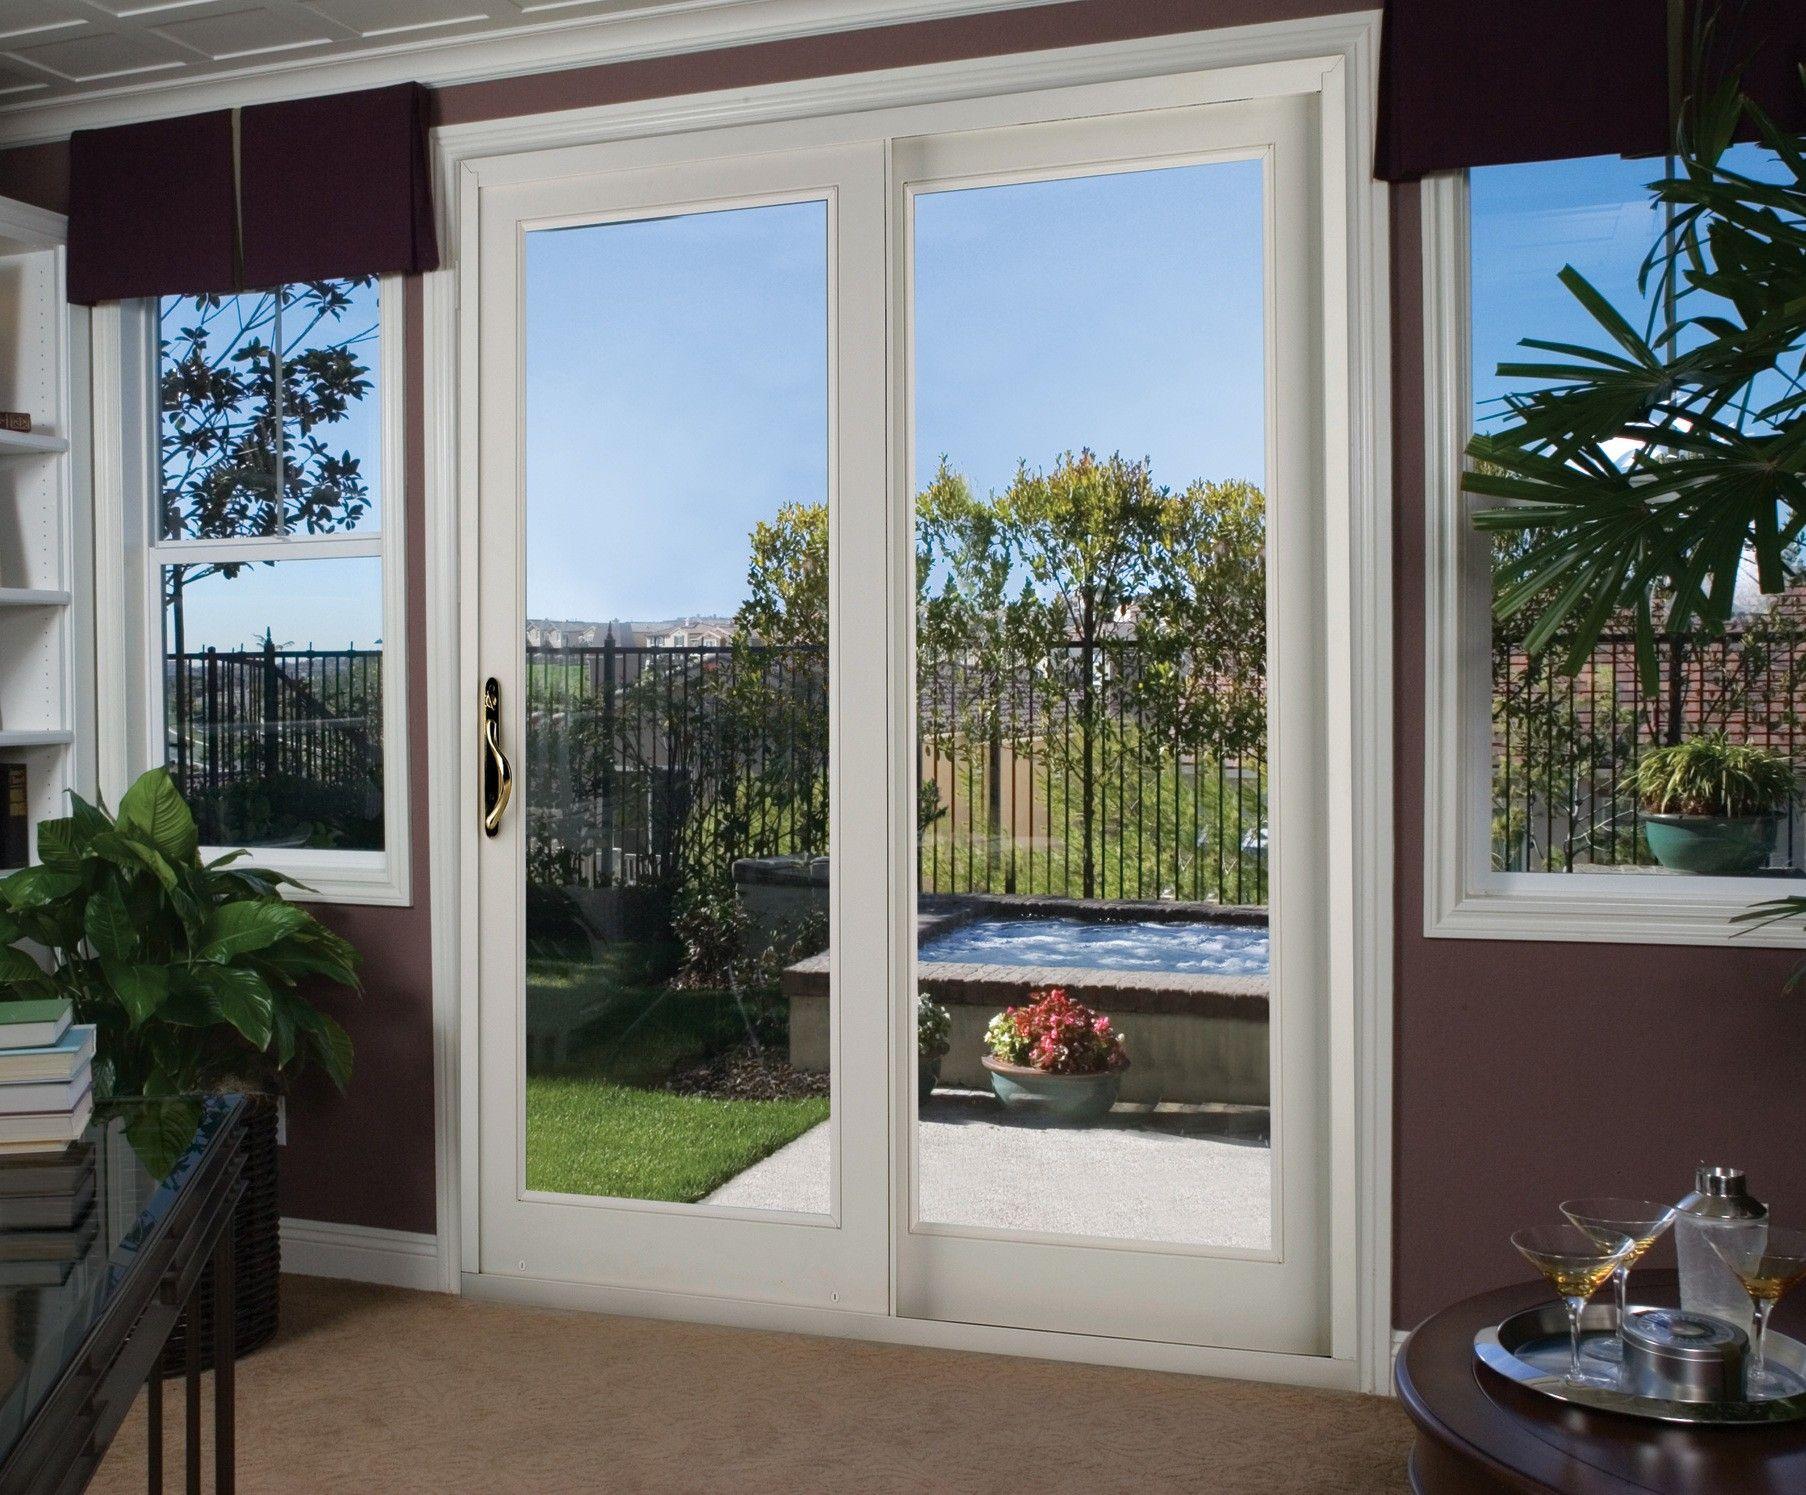 Interior Sliding Patio Door With Mirrored Glass Blinds Blinds For Patio Doors Sliding Patio Doors Patio Doors Modern Patio Doors